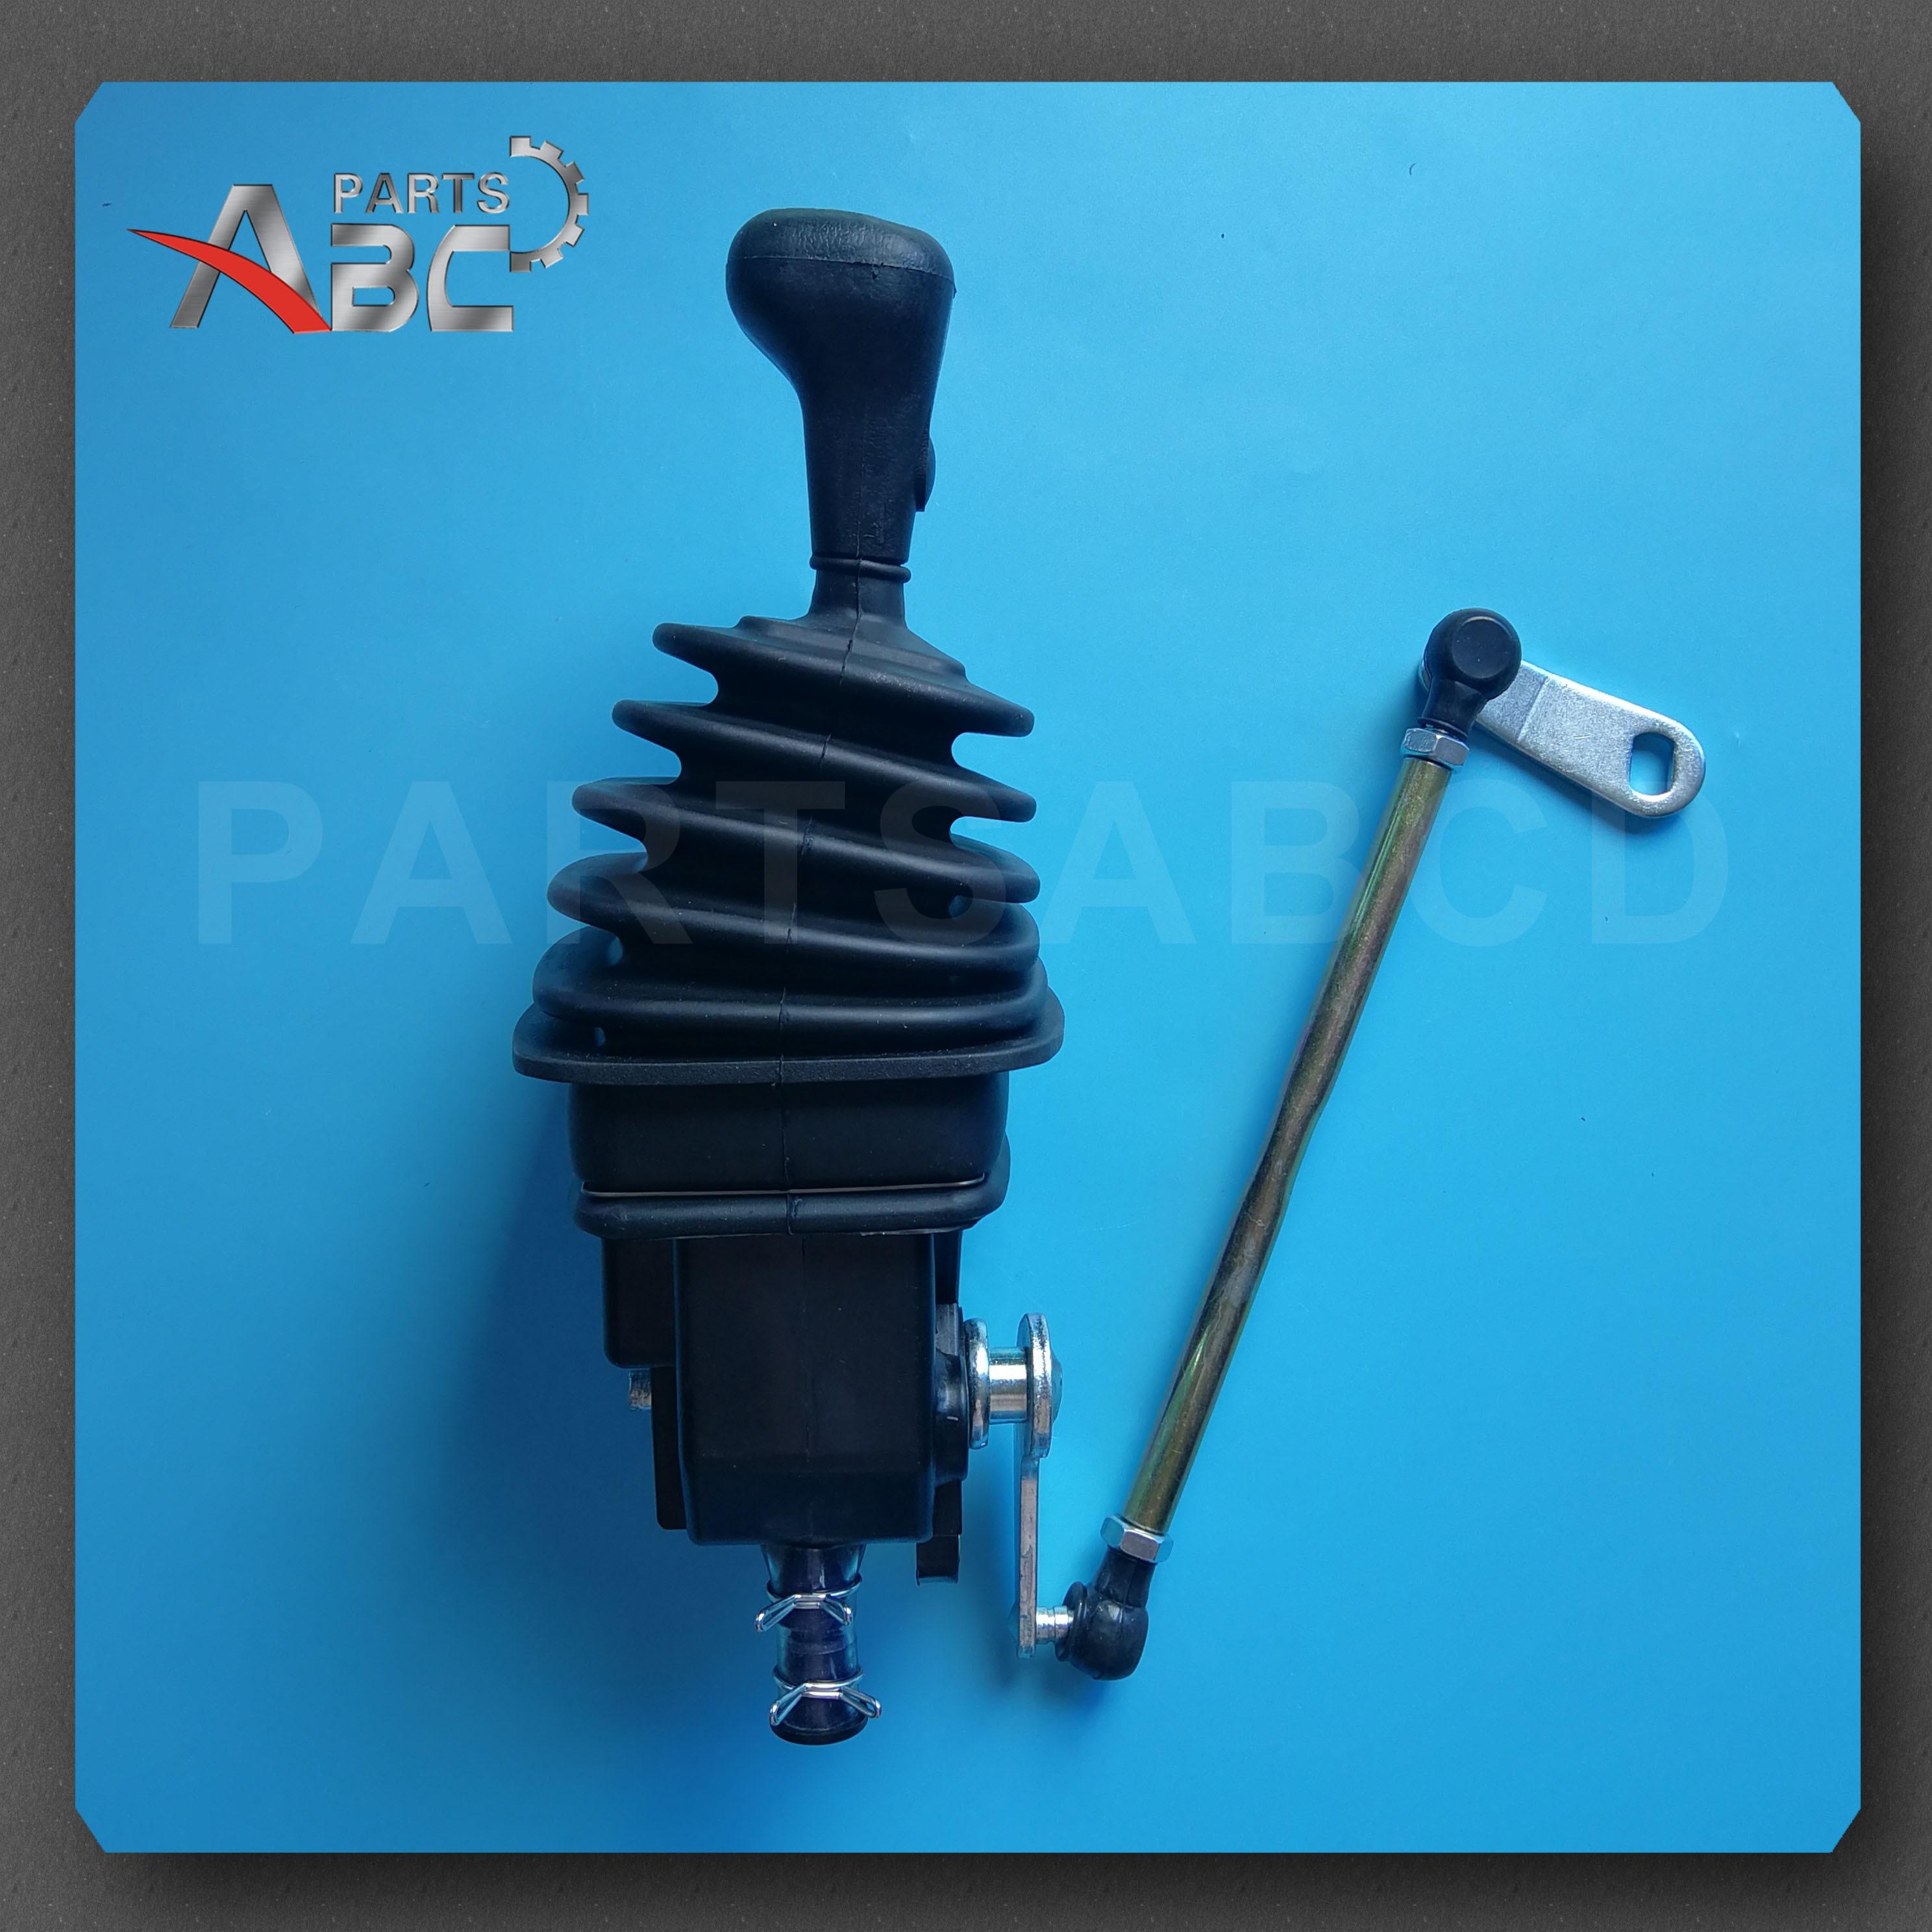 Engrenagem Shifter Montagem para HISUN 500CC 700CC HS500 HS700 23400-055-0000 / 23500-115-0000